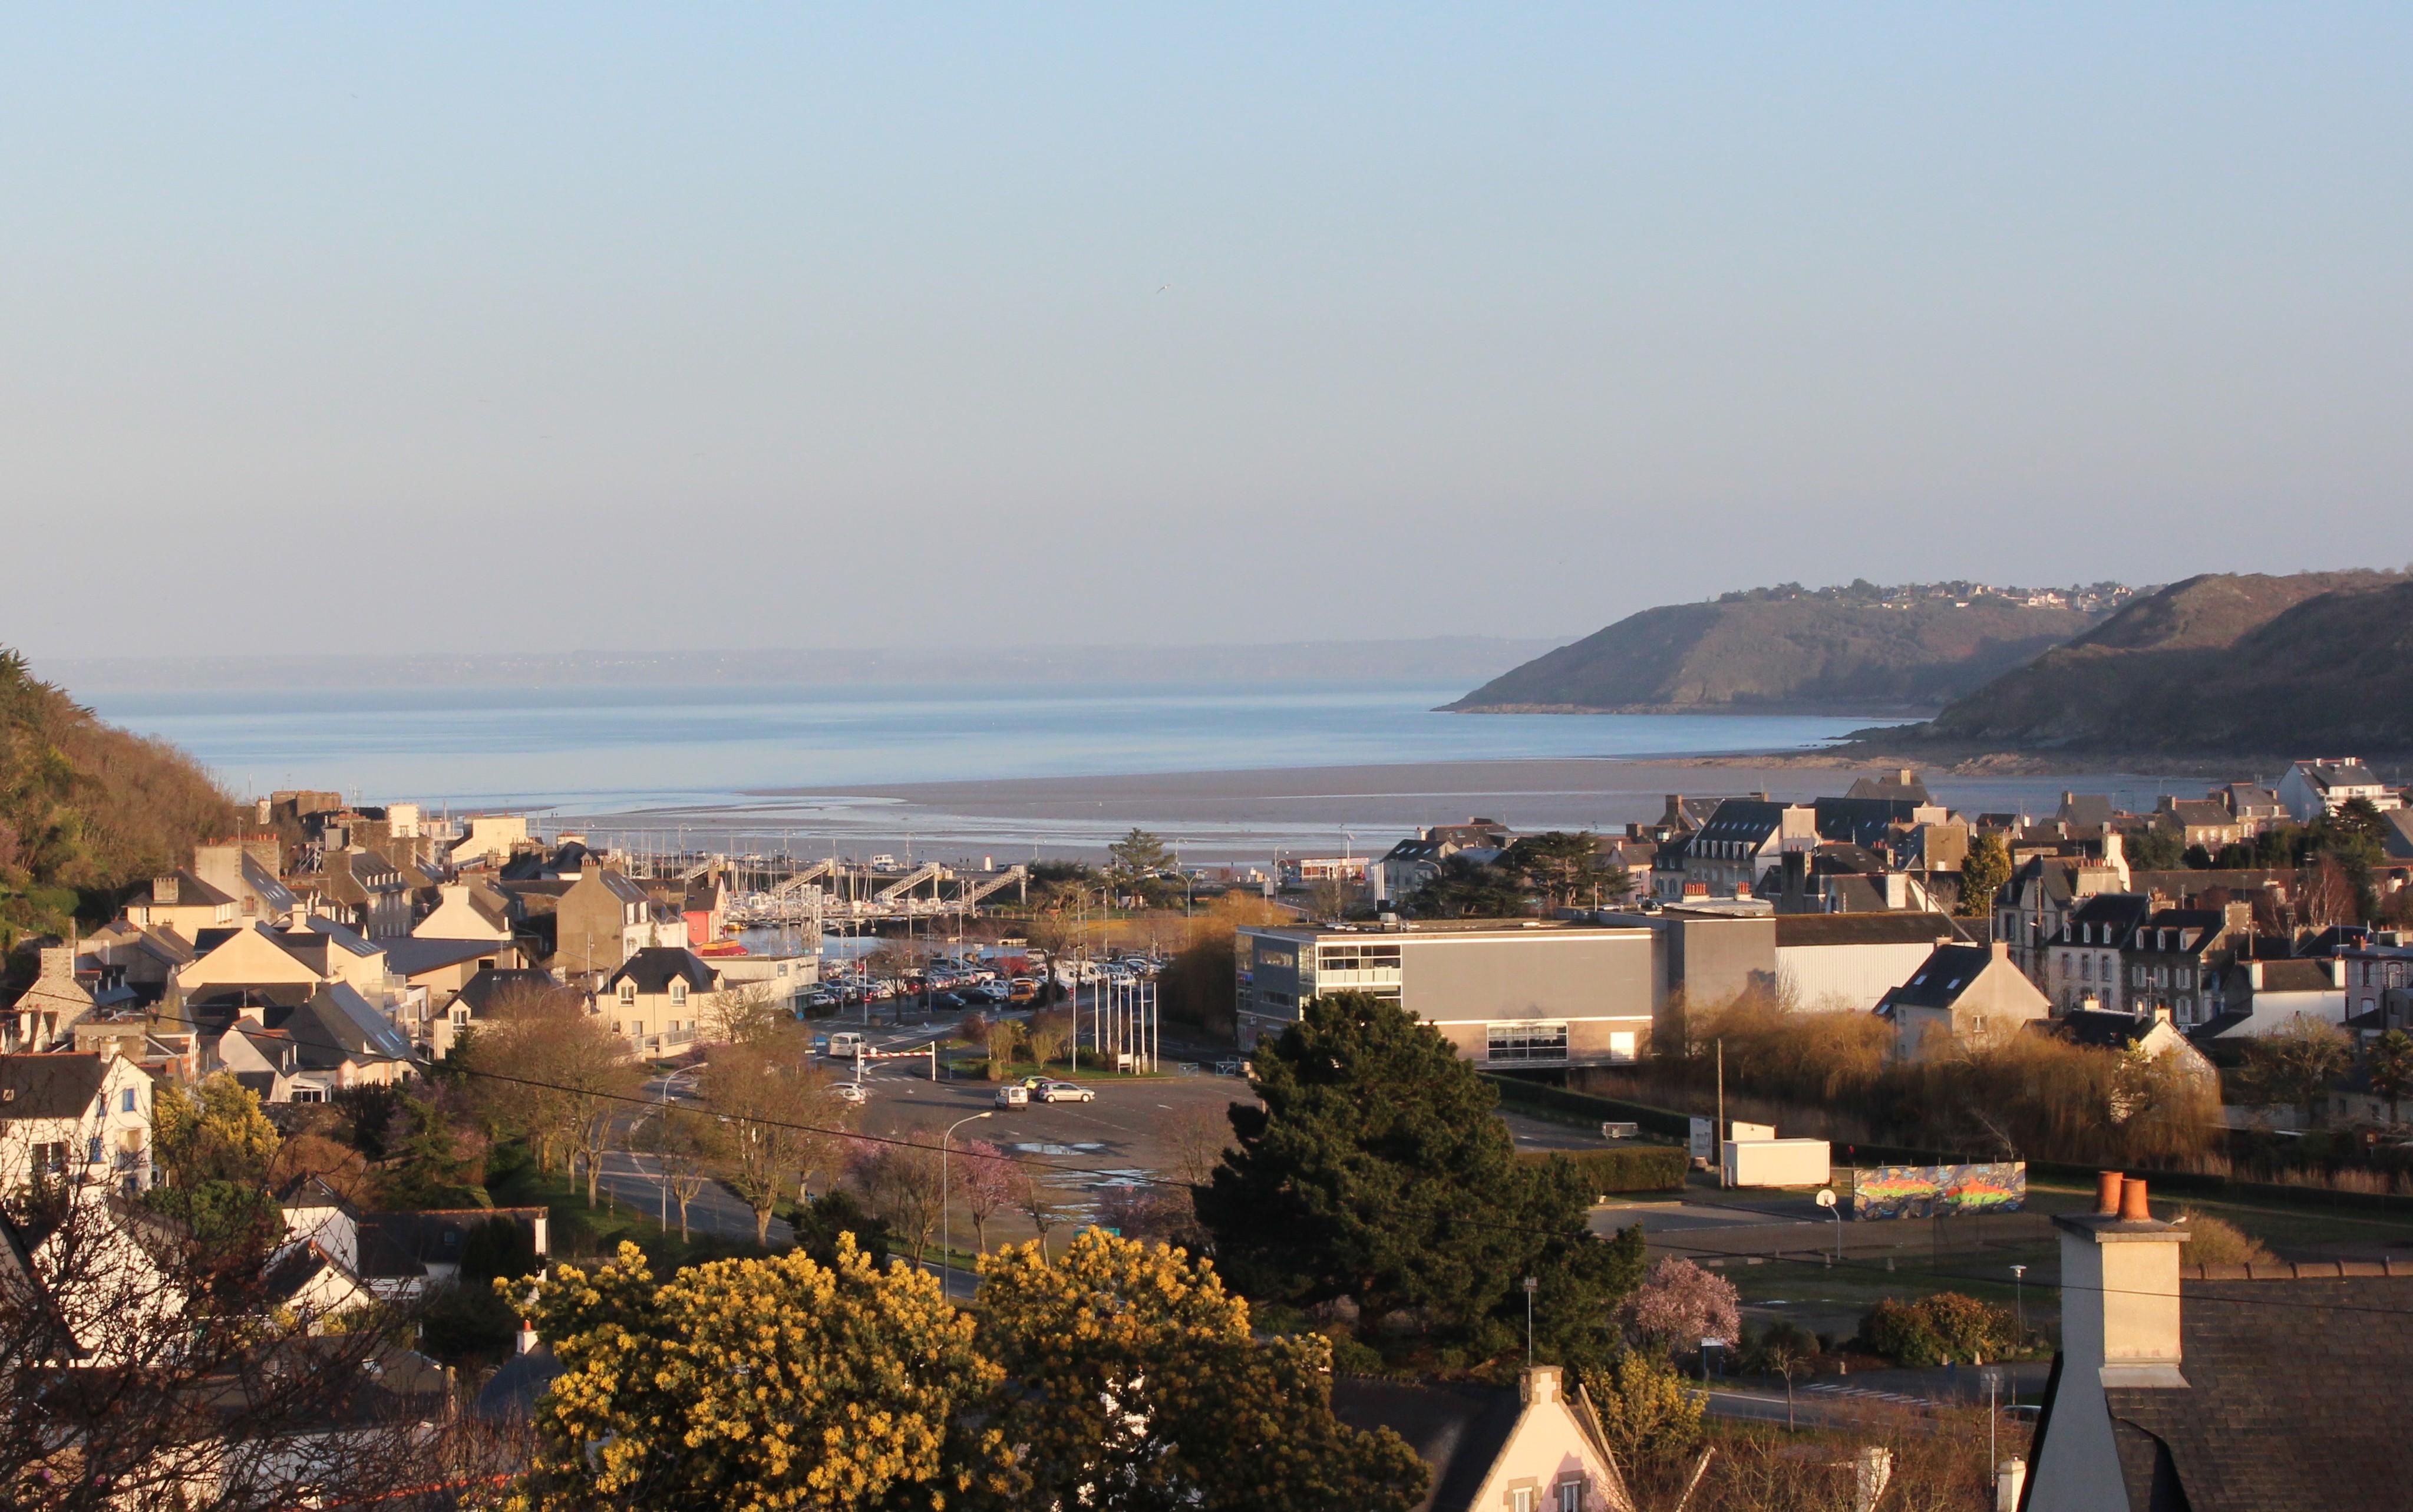 Gwel Meur, location Binic vue imprenable sur mer